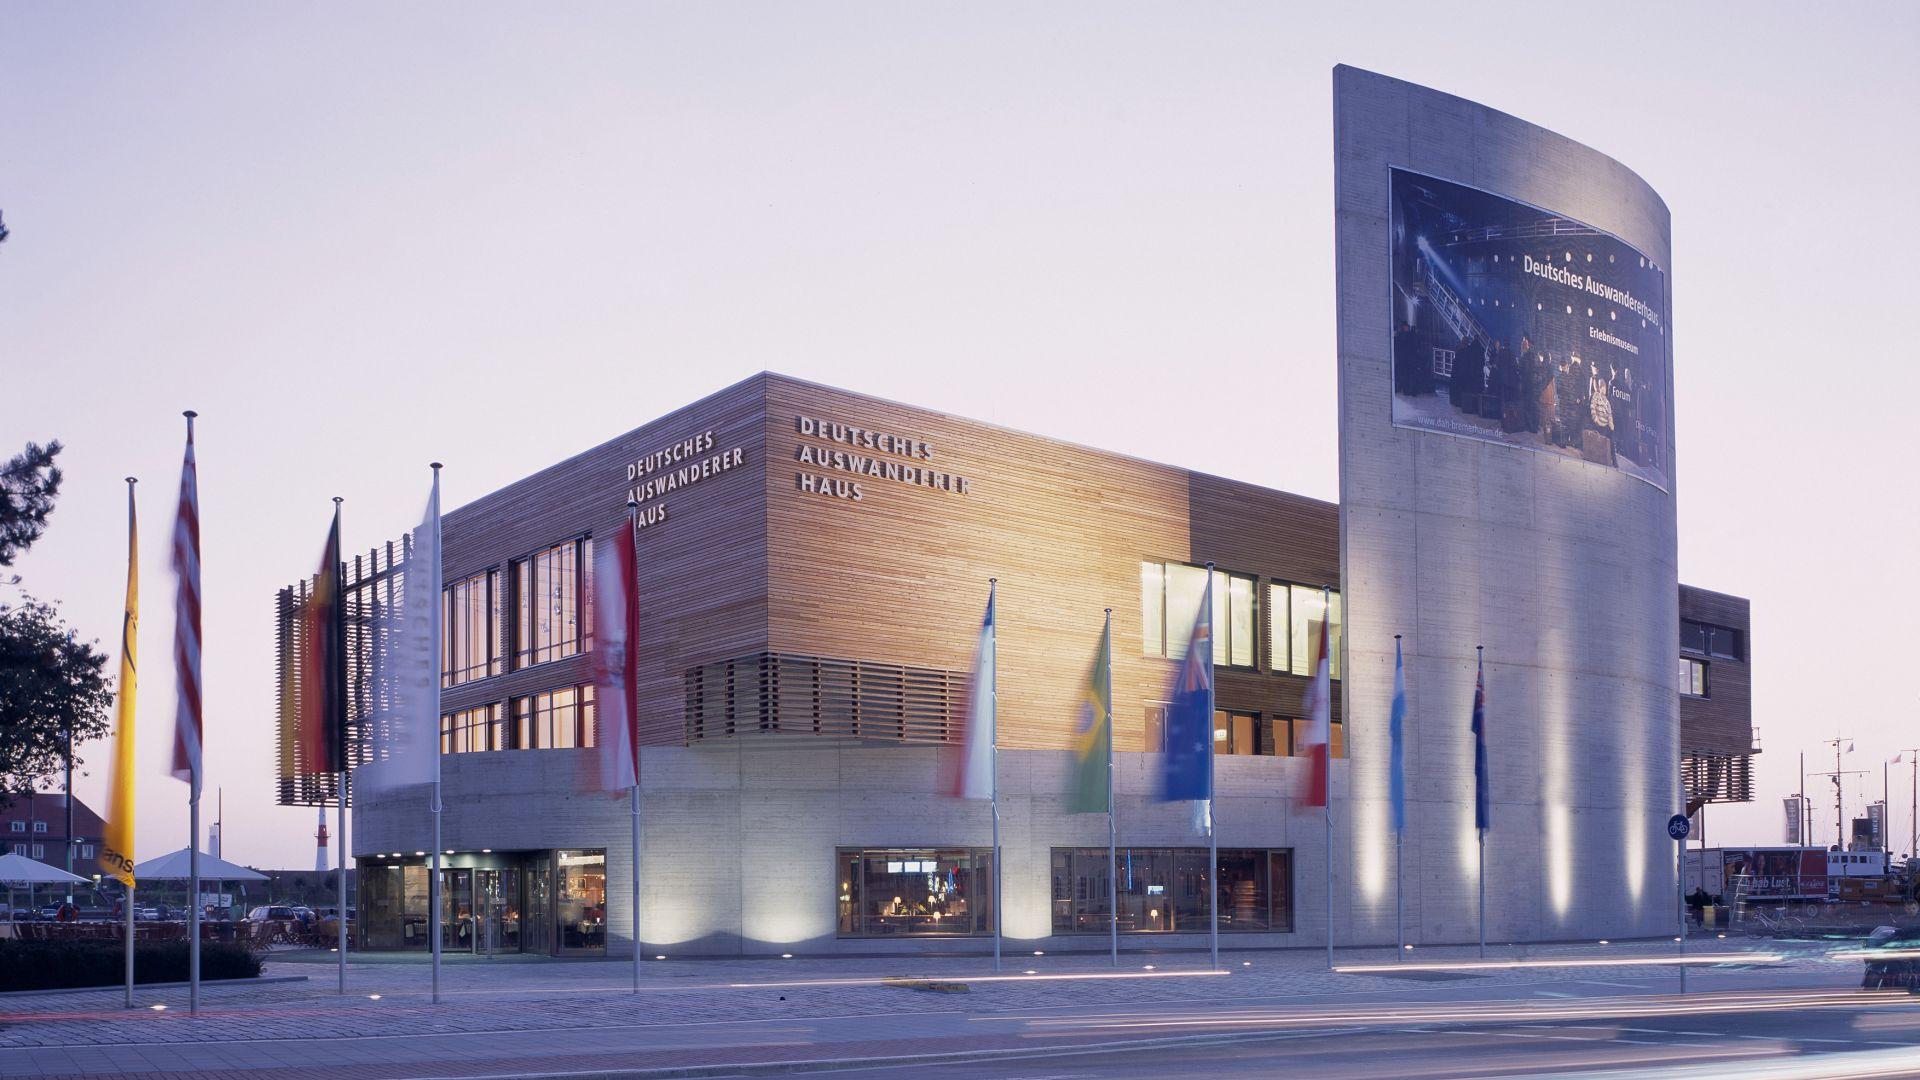 Bremerhaven: German Emigration Center, exterior view